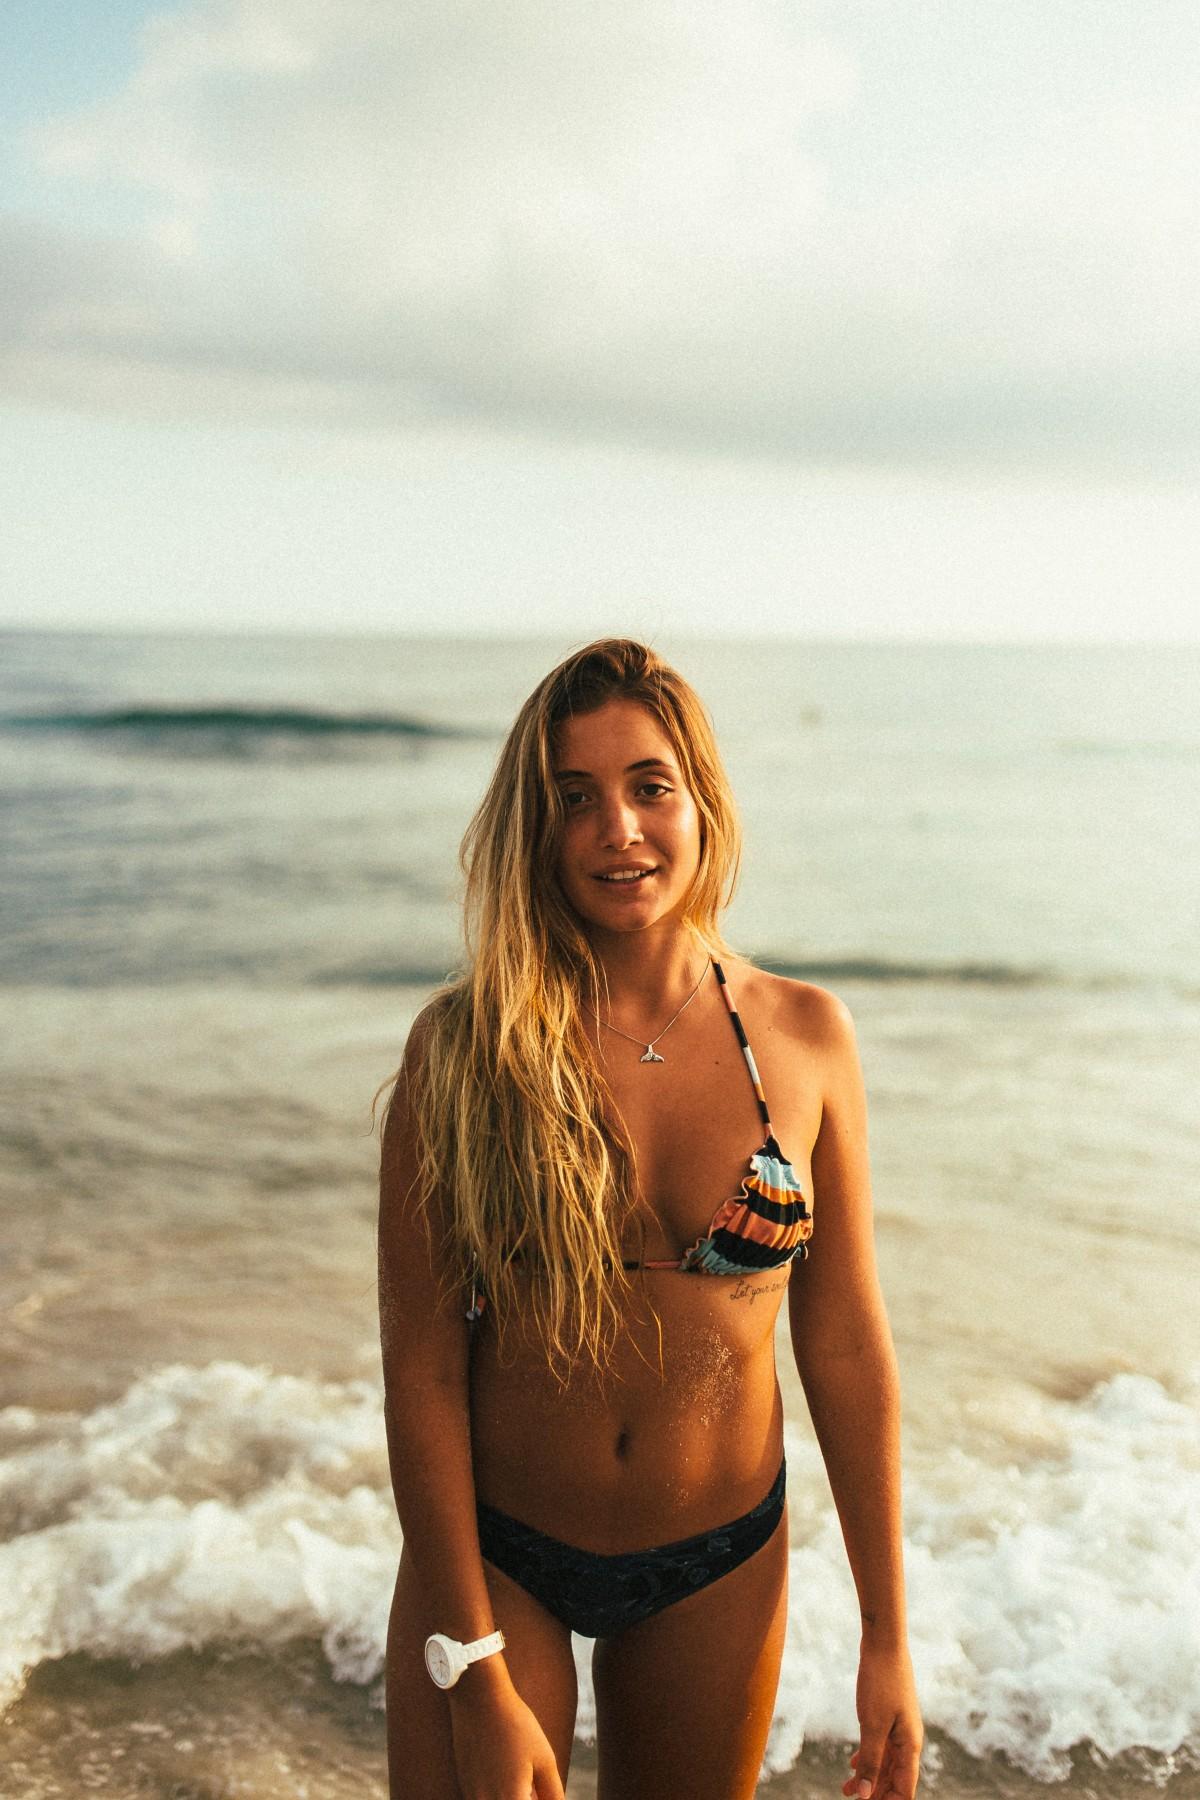 Free Images : photograph, bikini, beach, clothing, beauty